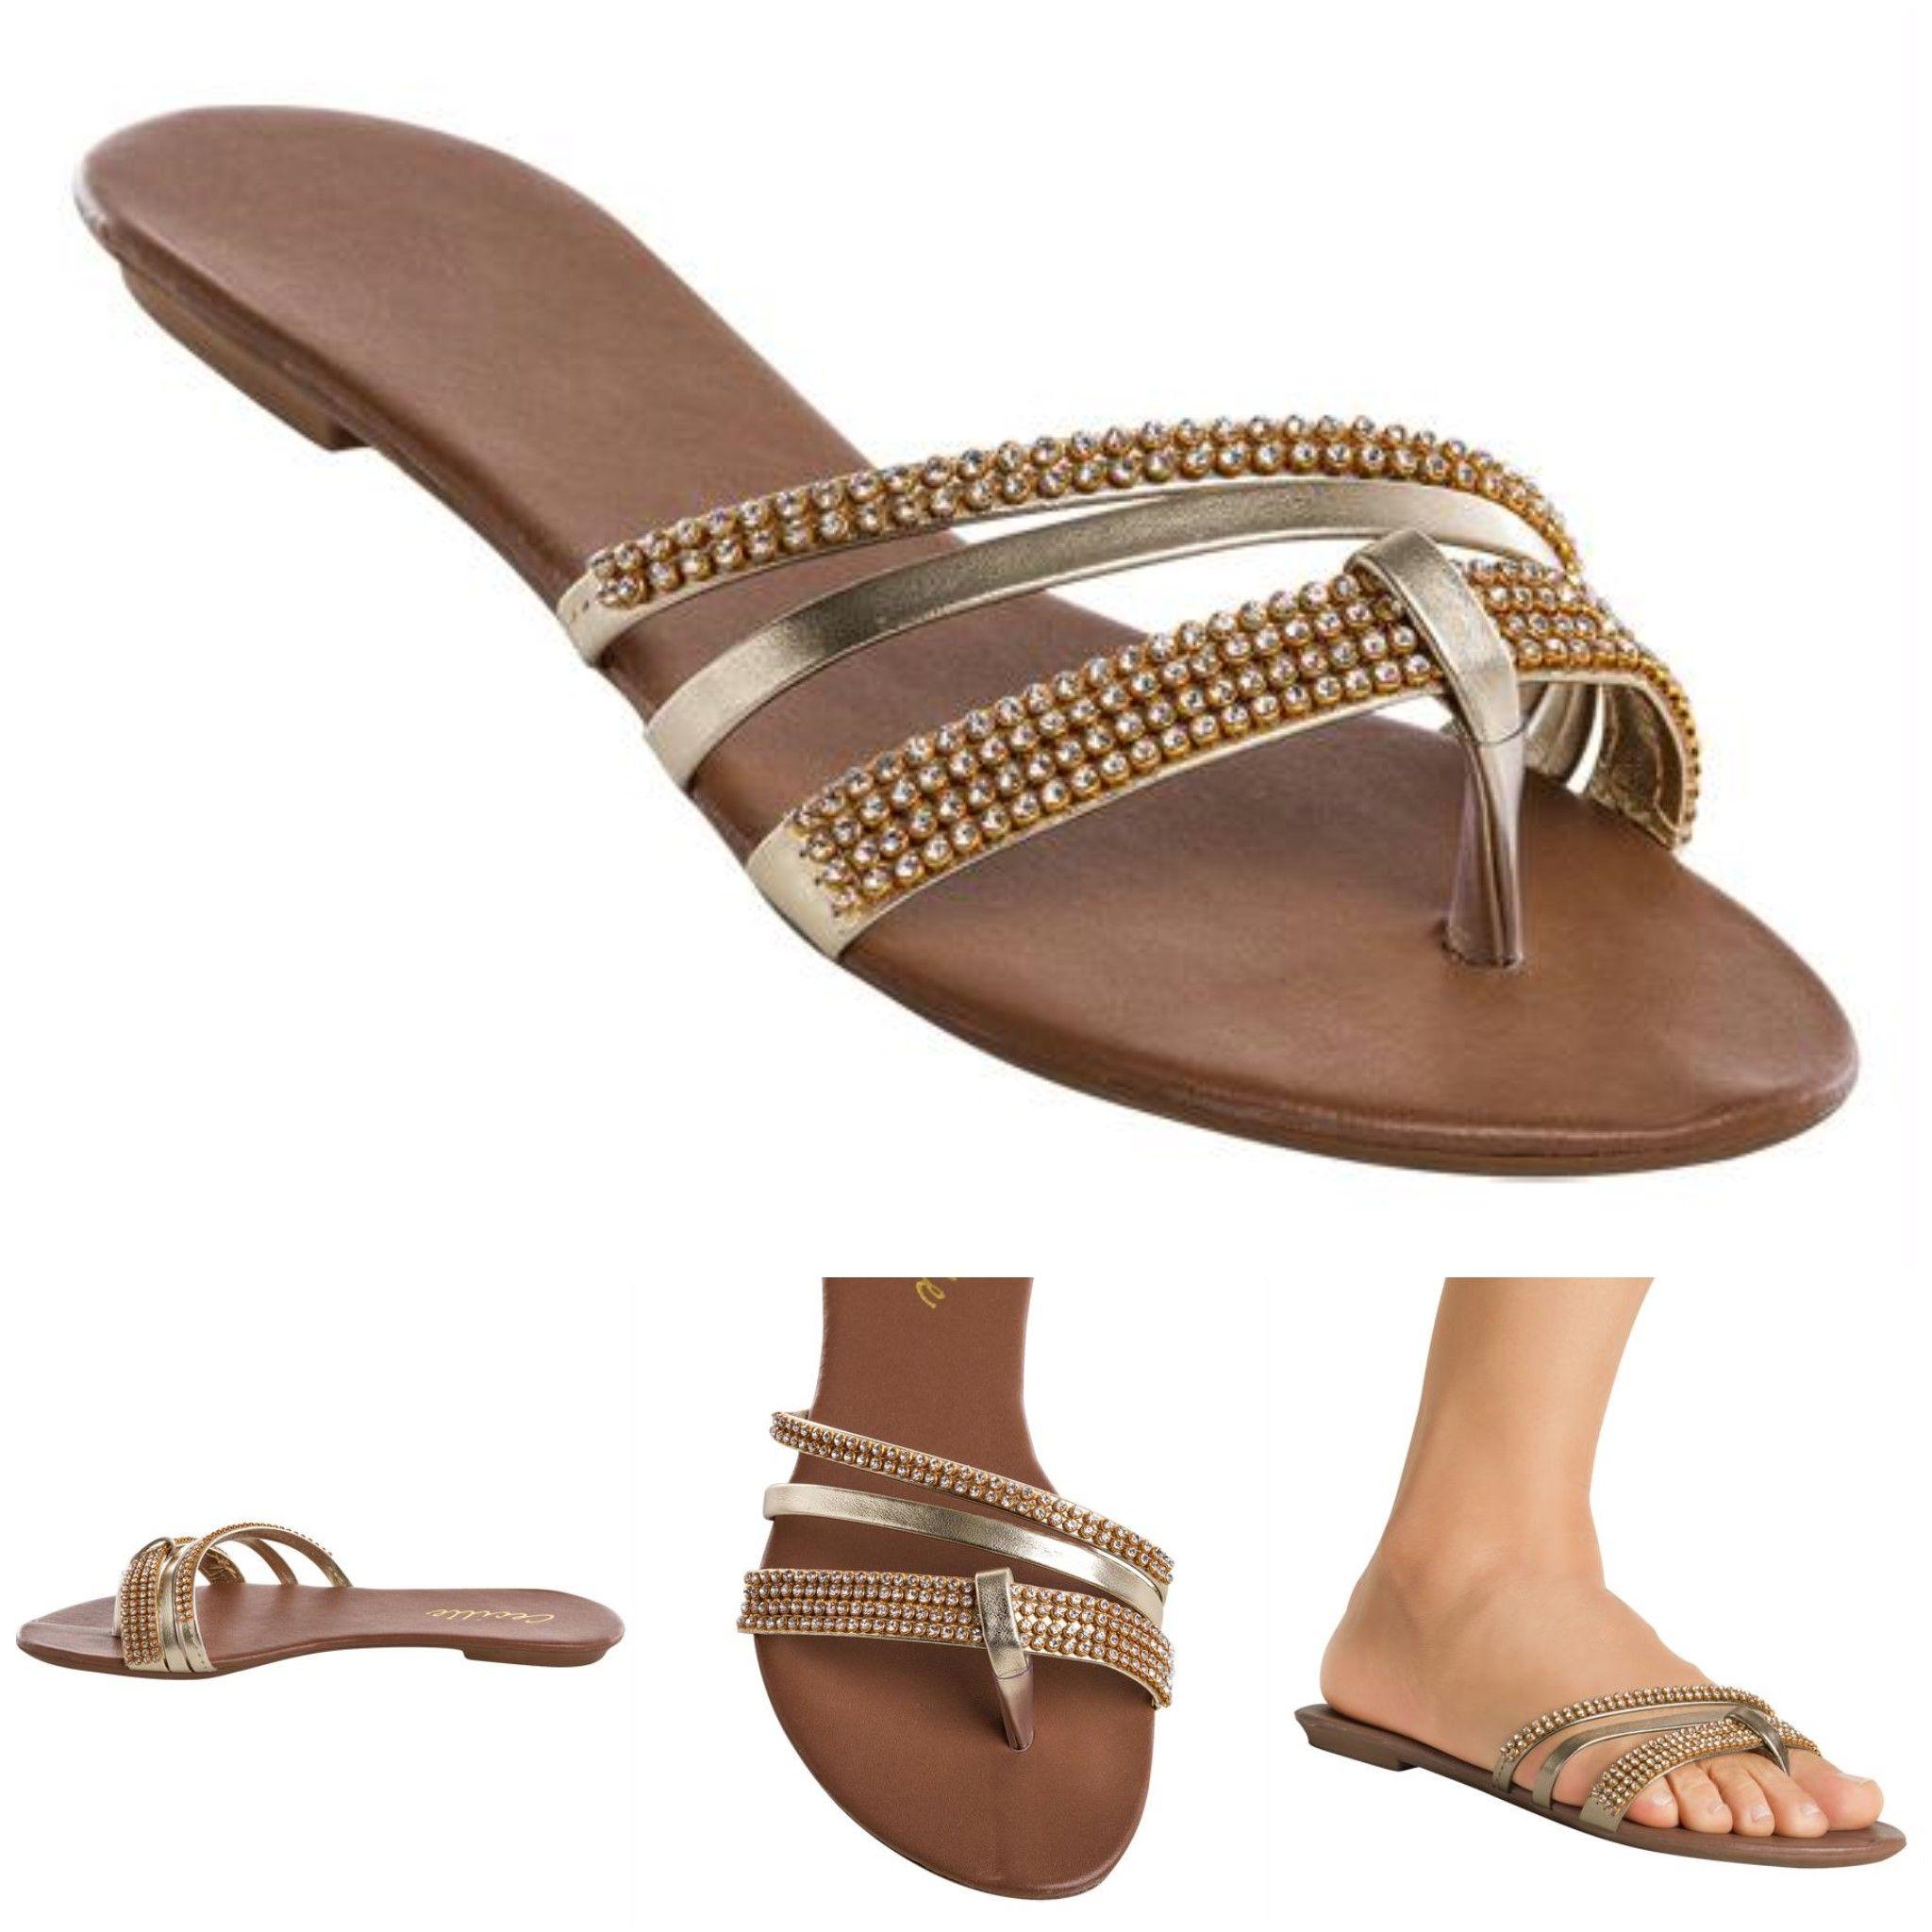 De sandalia azul da marca moleca